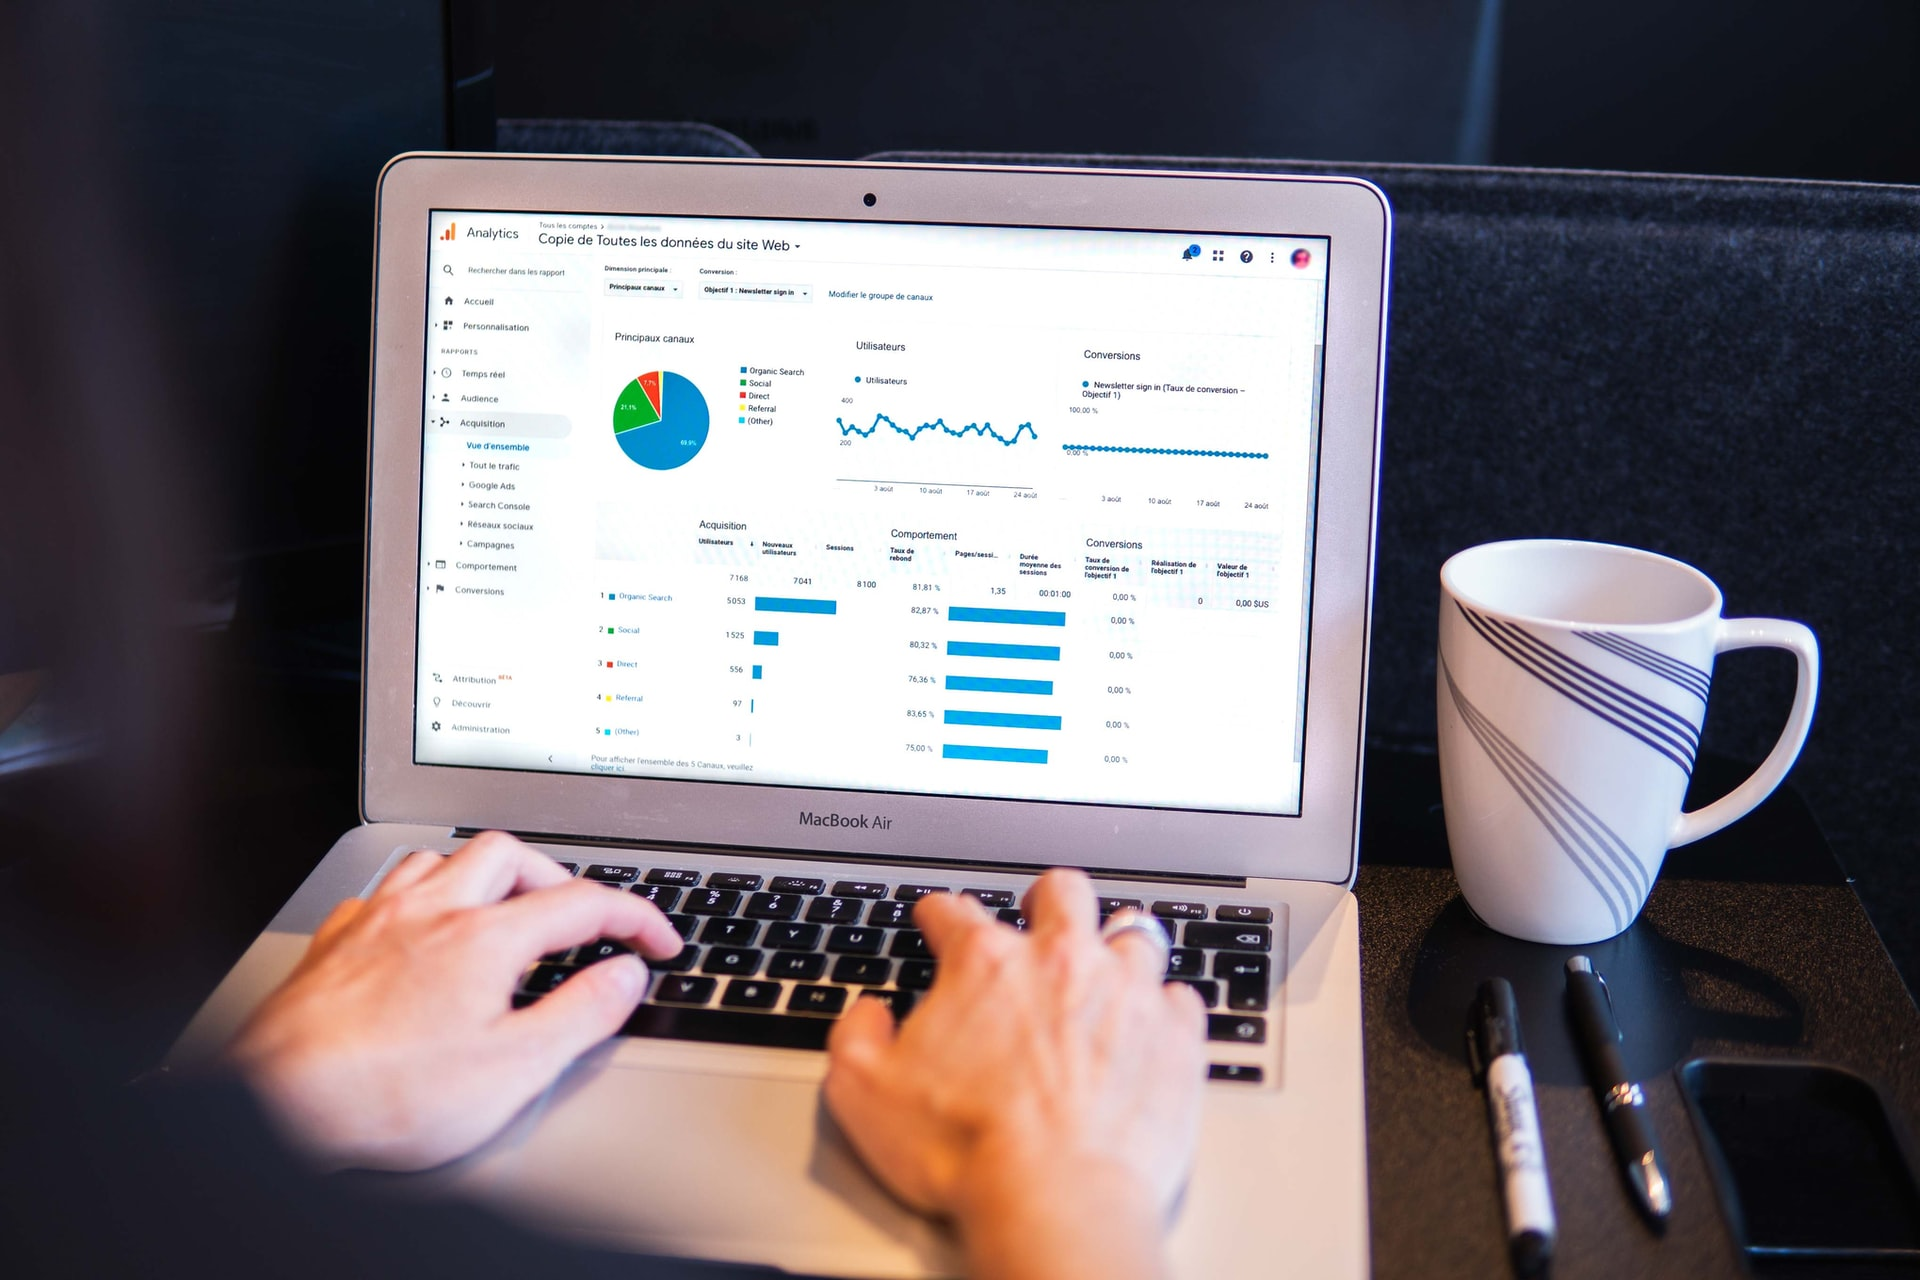 Digital Marketing : Mengenal Apa Itu Pemasaran Digital Dan Manfaatnya